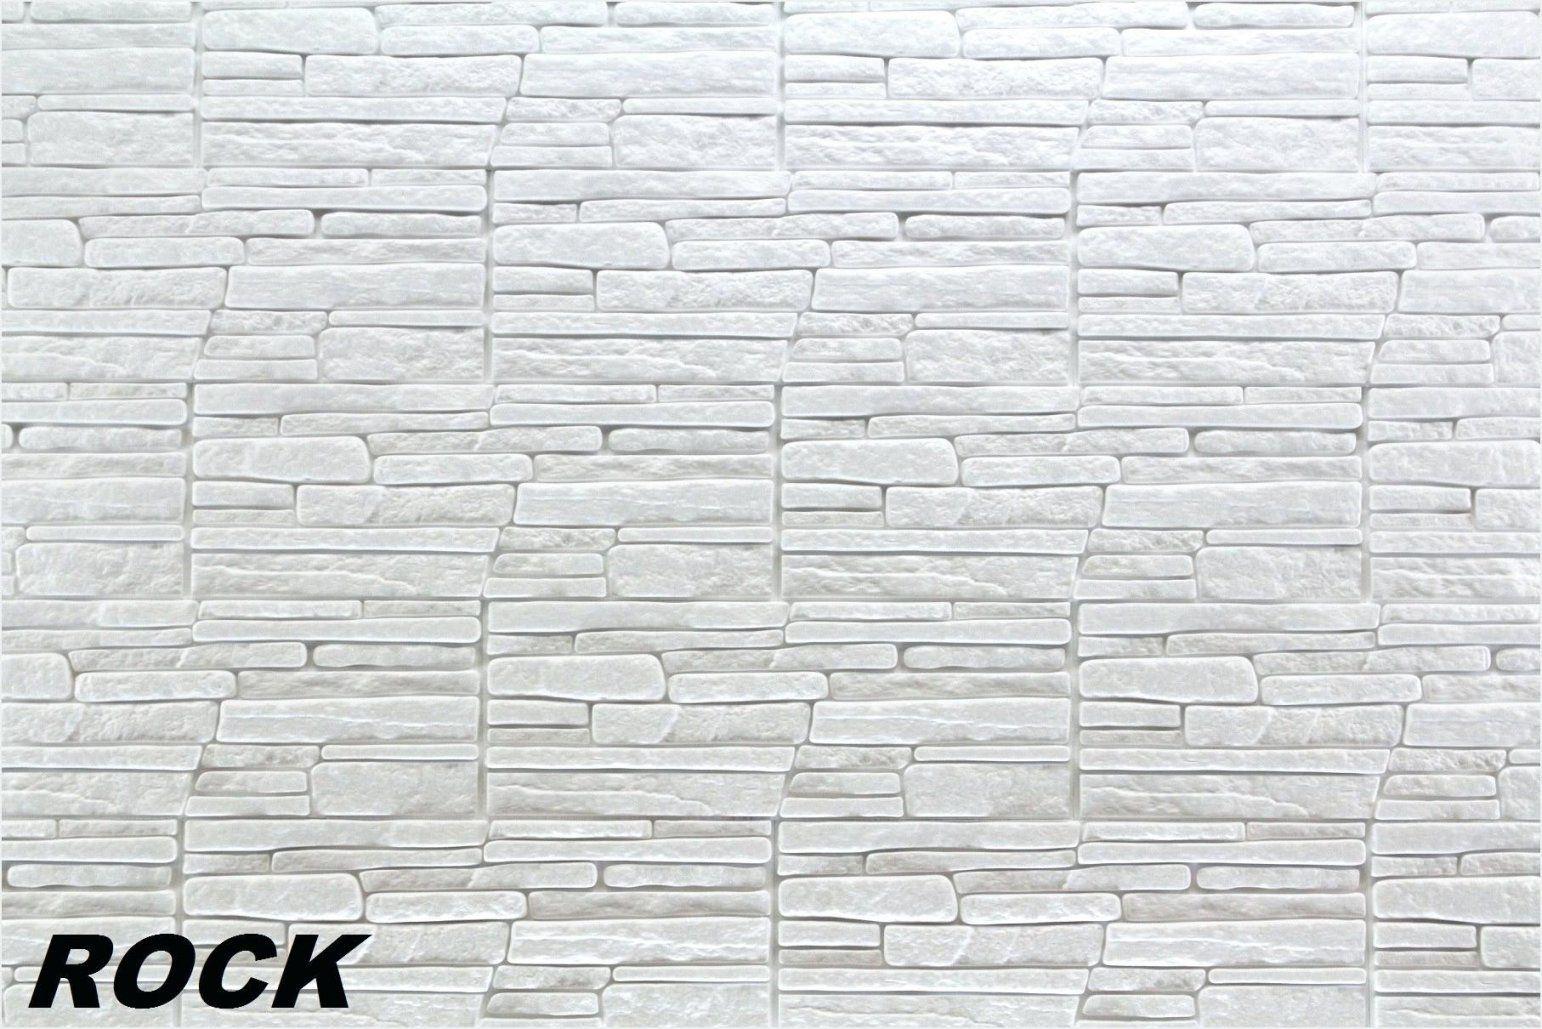 Luxury Styropor Wand Wandverkleidung Steinoptik Innen Kunststoff von Wandverkleidung Steinoptik Innen Kunststoff Bild